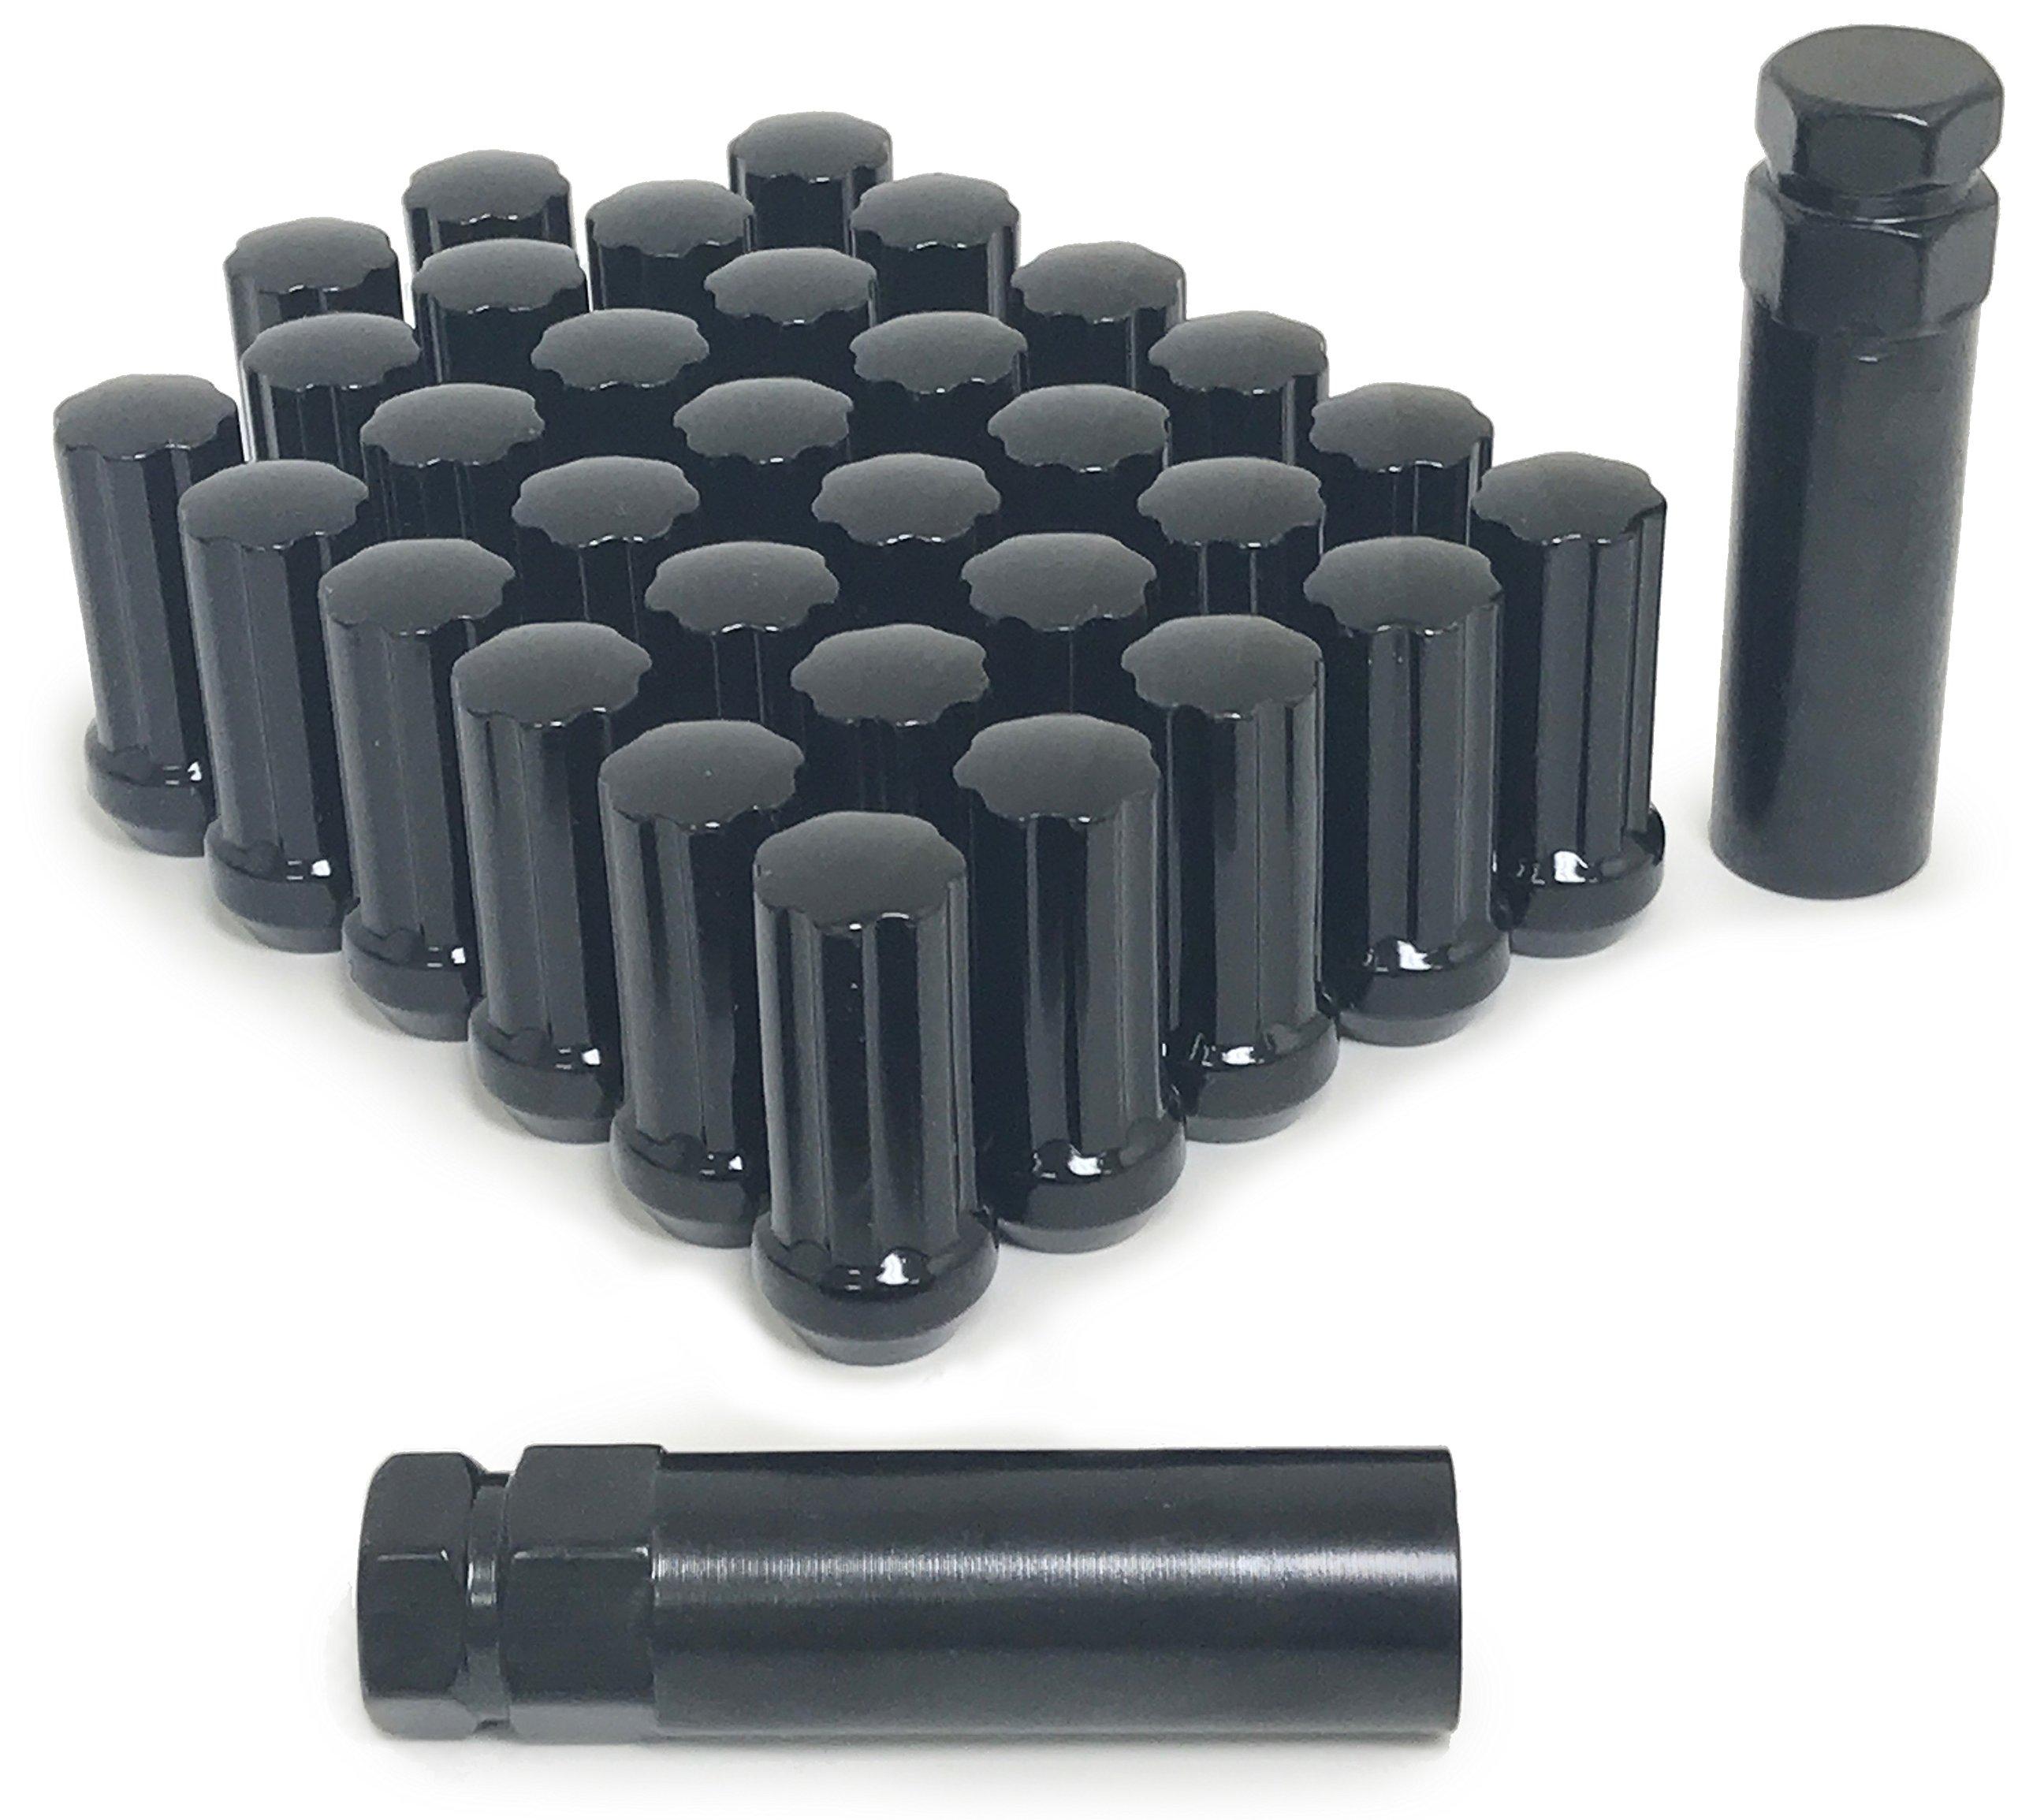 32 BLACK SPLINE LUG NUTS   14X1.5   CHEVY GMC   SILVERADO HUMMER   8X6.5